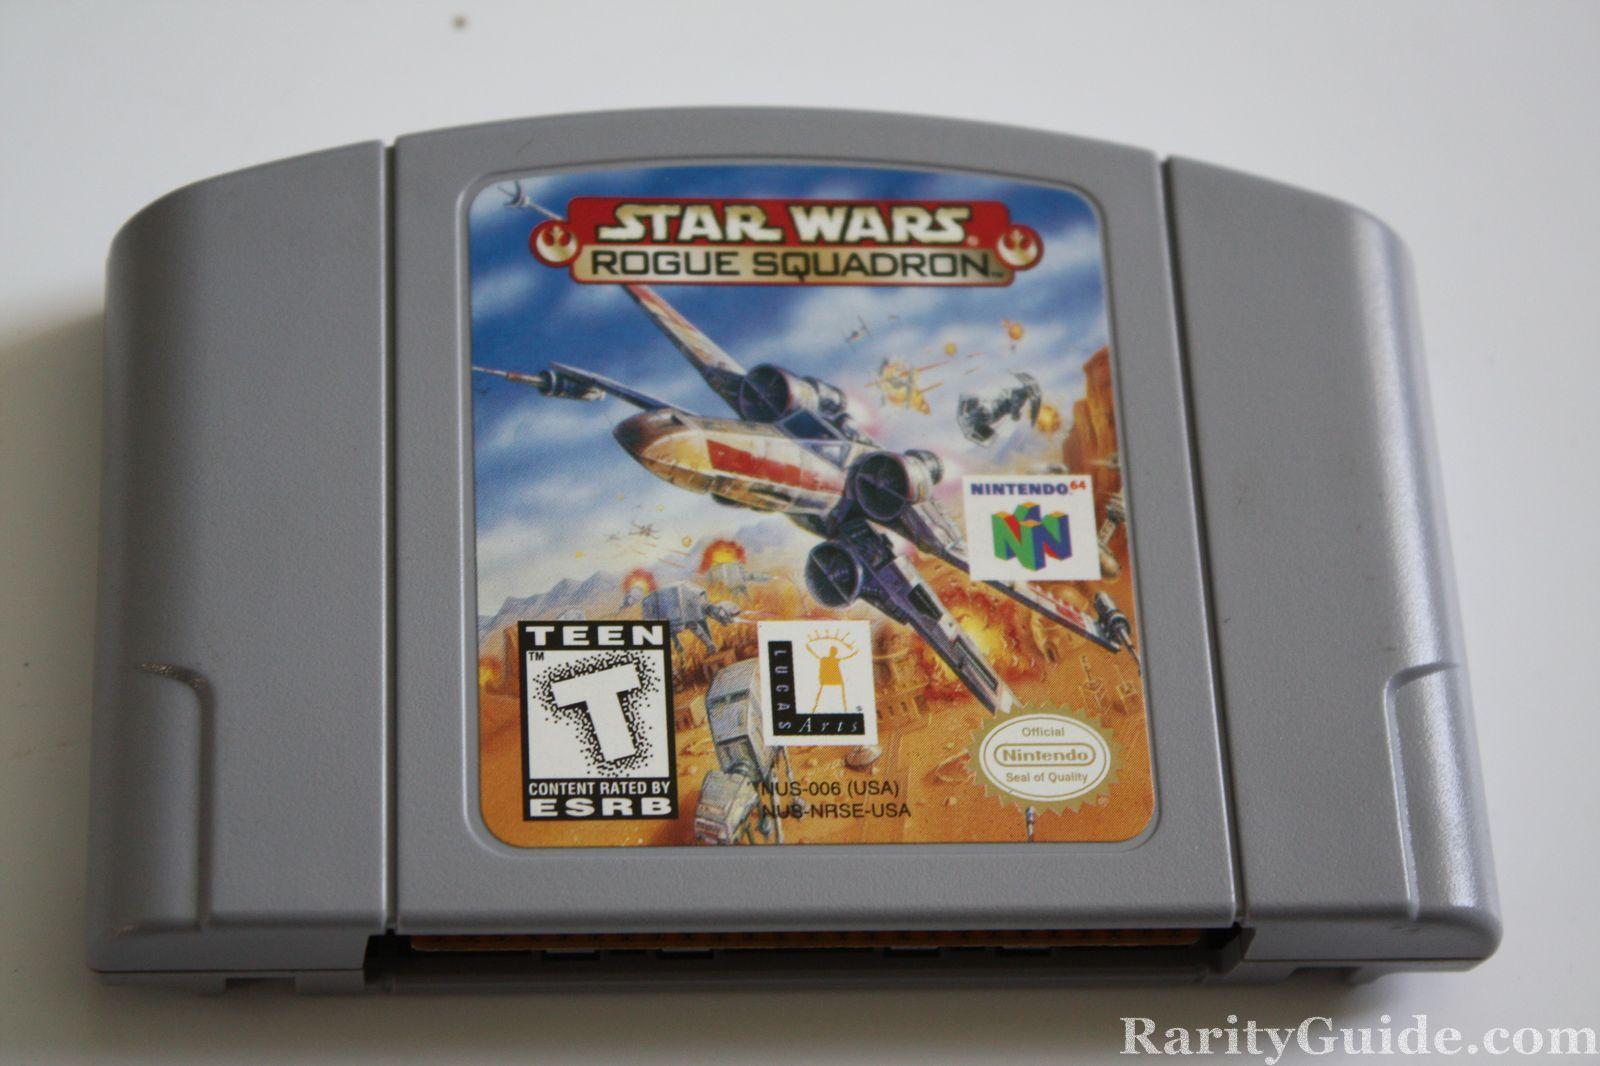 Nintendo 64 N64 Star Wars Rogue Squadron Video Game Cartridge